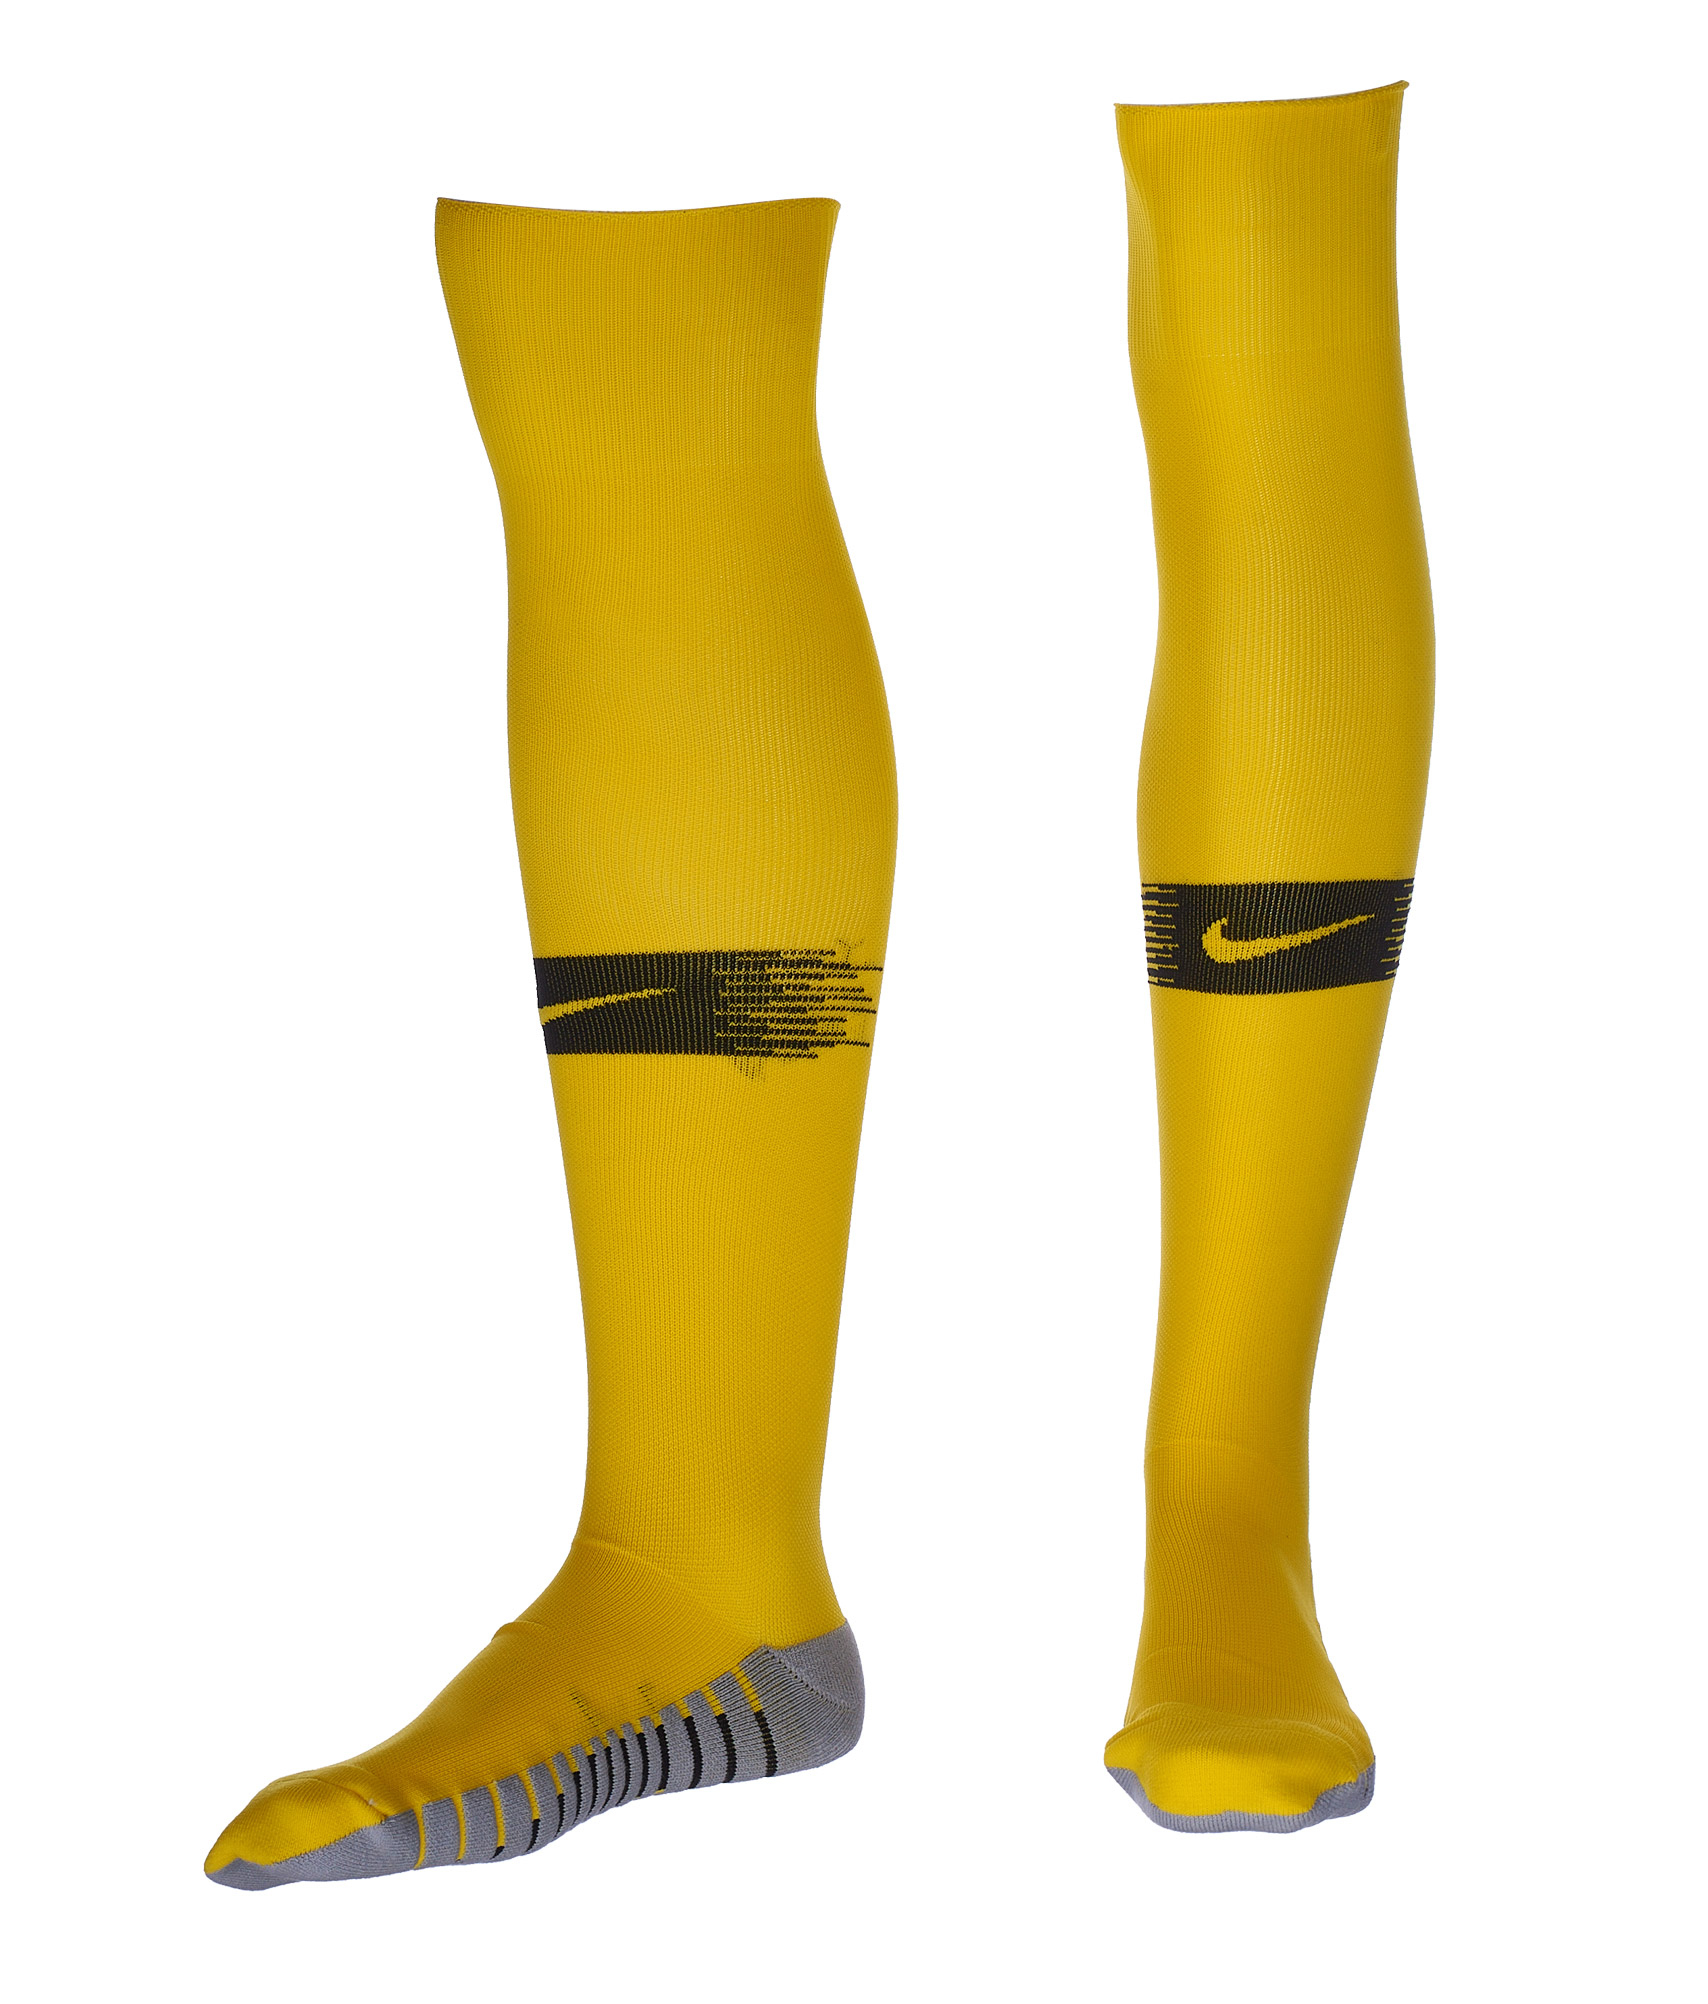 Гетры вратарские Nike сезона 2018/2019 Nike Цвет-Желтый